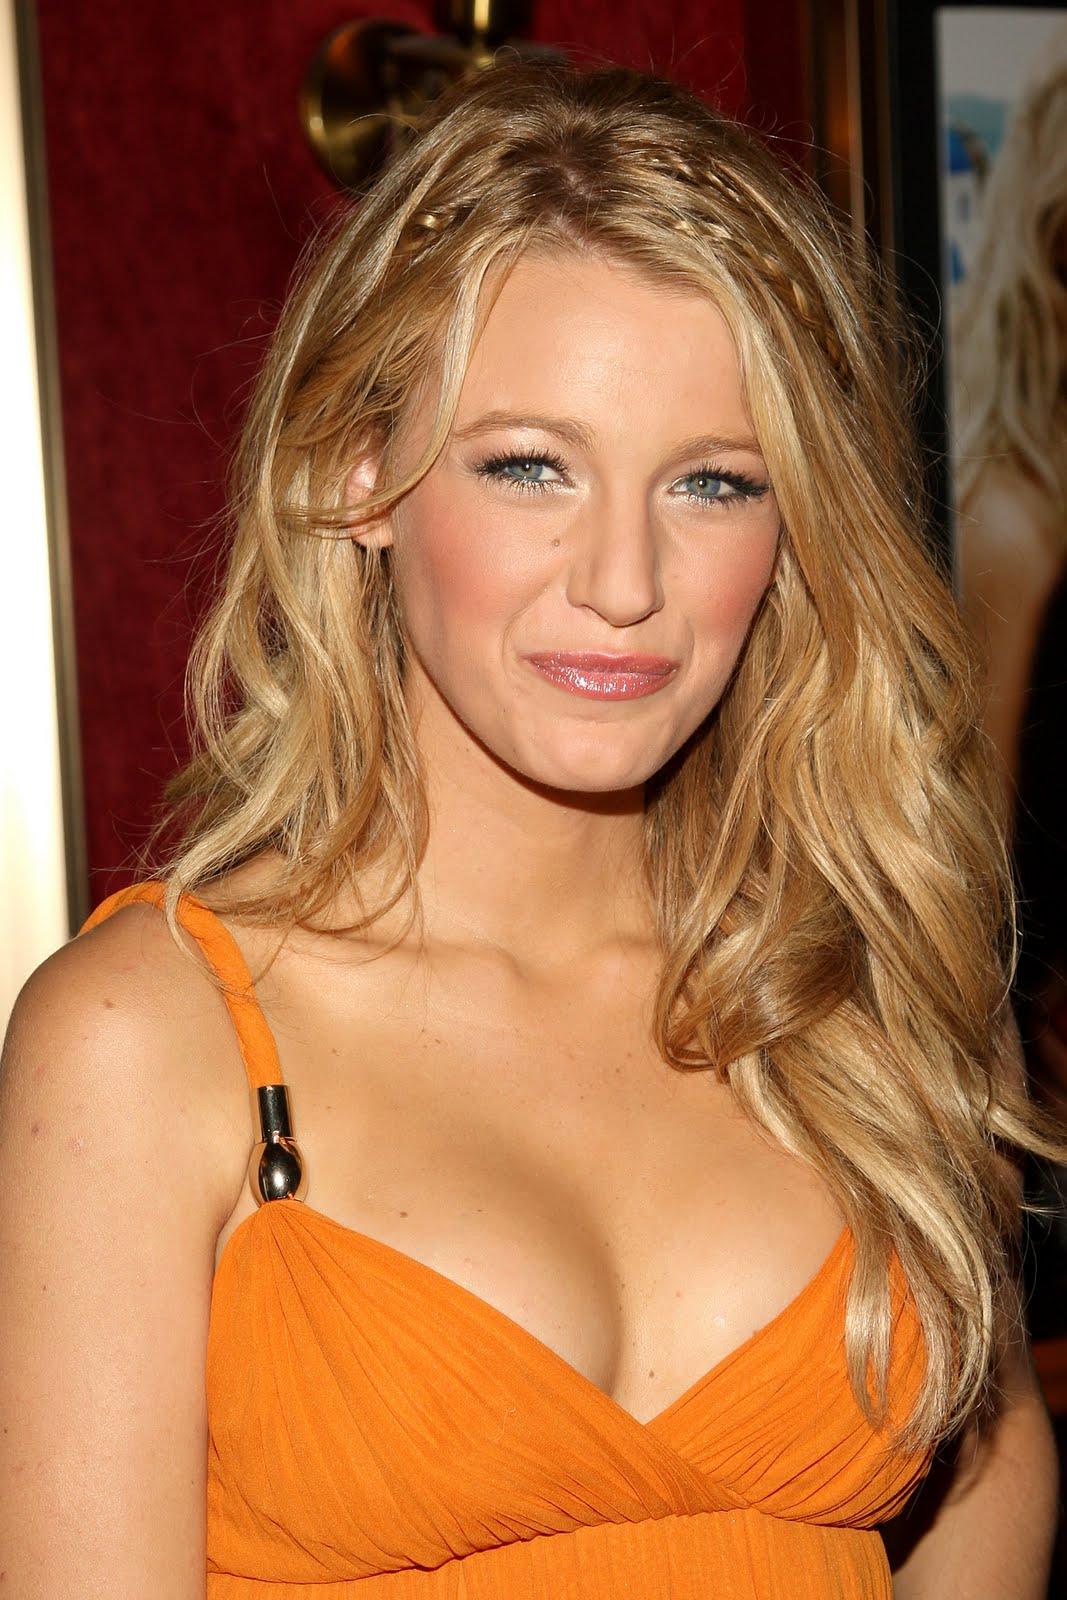 http://4.bp.blogspot.com/_csogD6ptEnI/SxIxMlK9ipI/AAAAAAAAFnk/2ZMOBt2G-nY/s1600/Jennifer_Garner_02.jpg